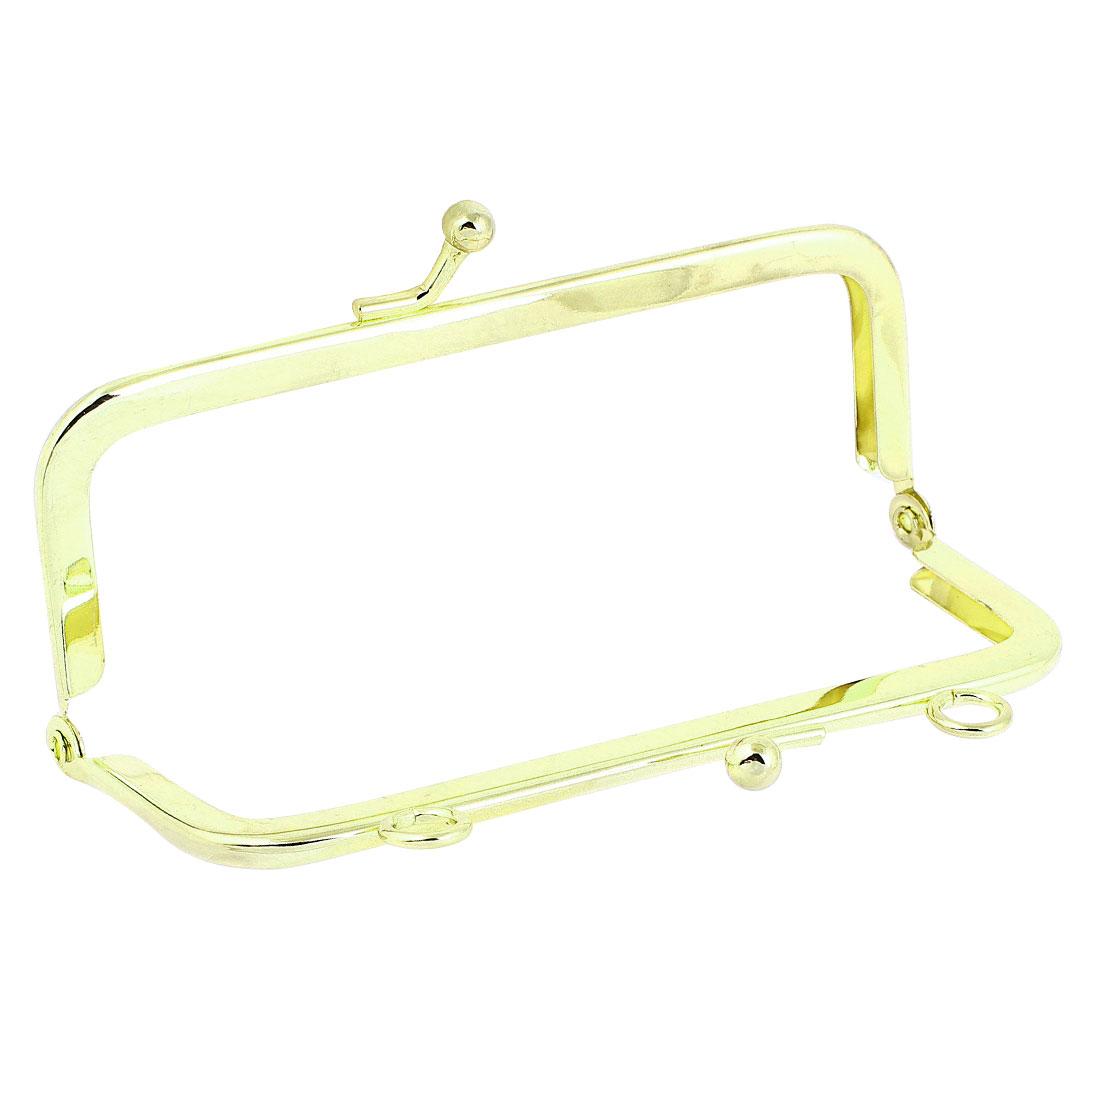 11.5cm Long Gold Tone Metal Arch Shape Kiss Lock Frame for Handbag Purse Wallet